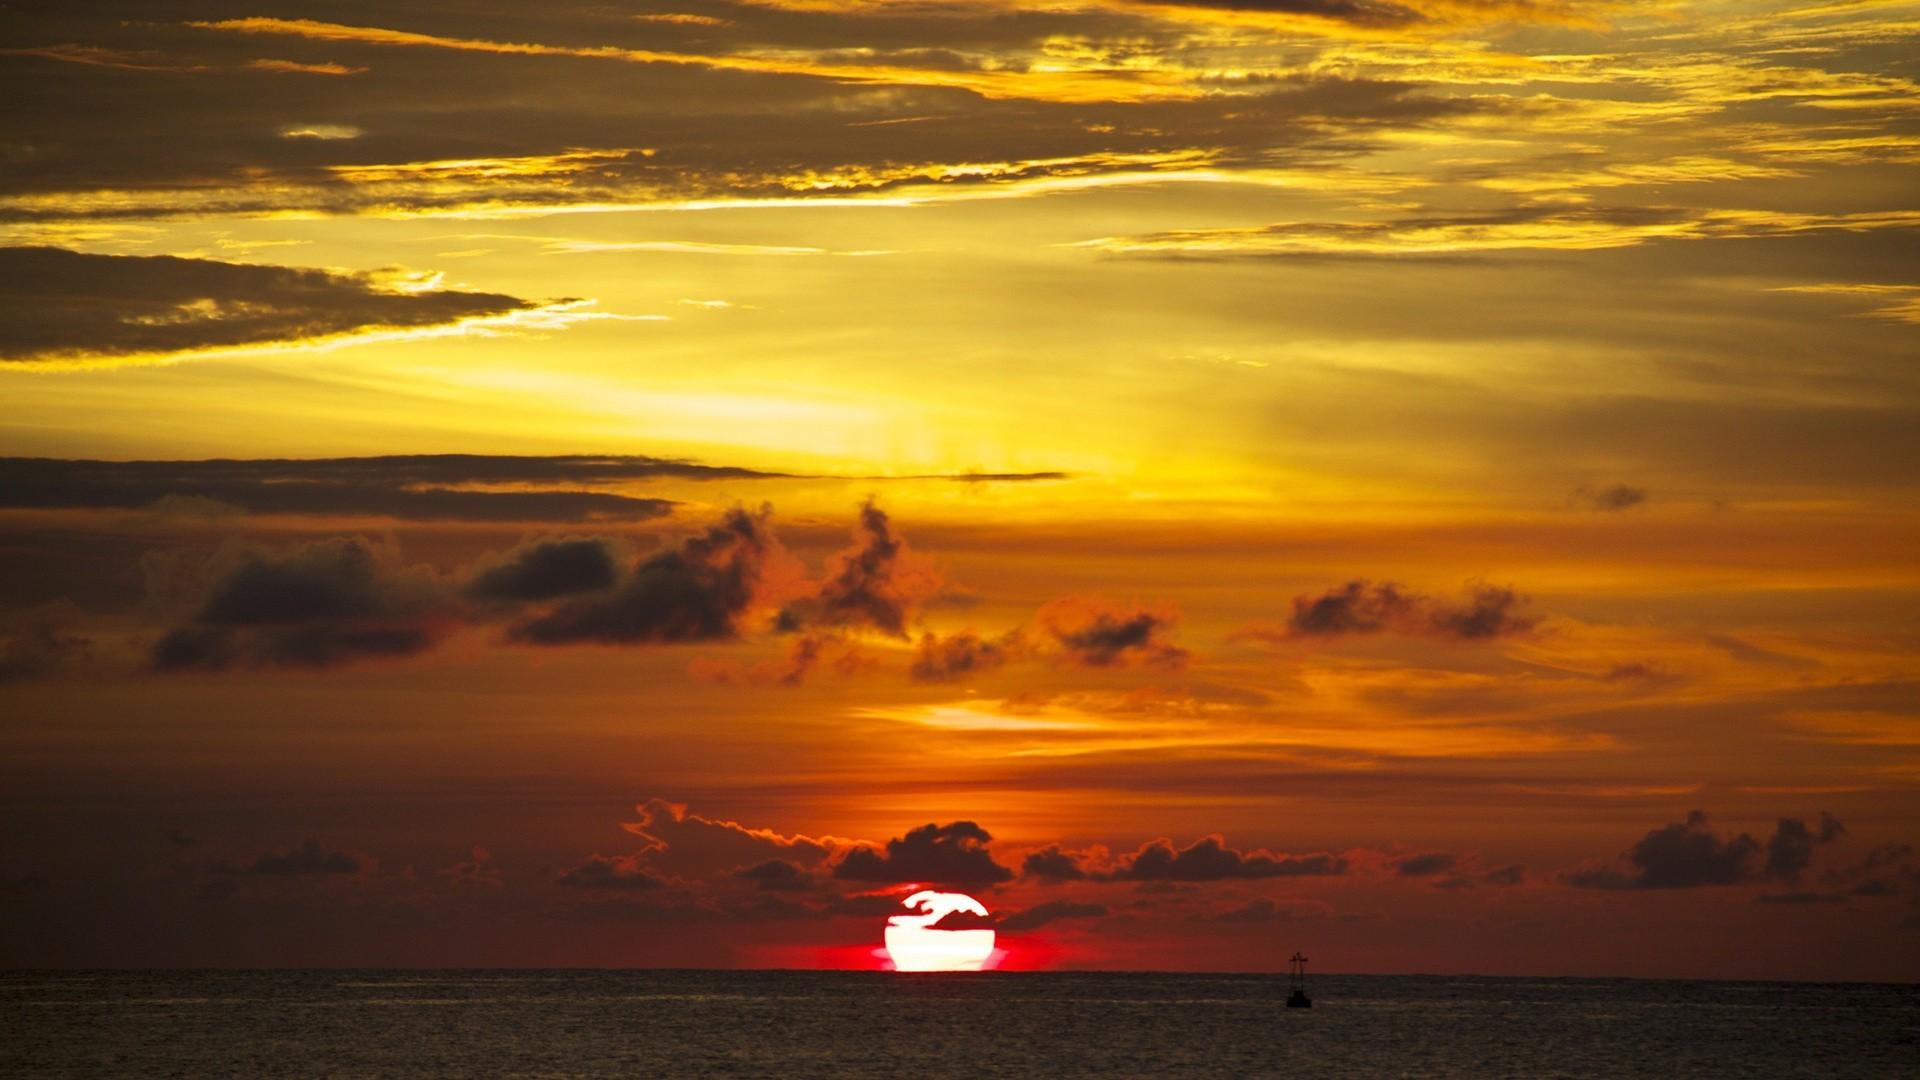 General 1920x1080 beach sunset sunlight Sun clouds sea